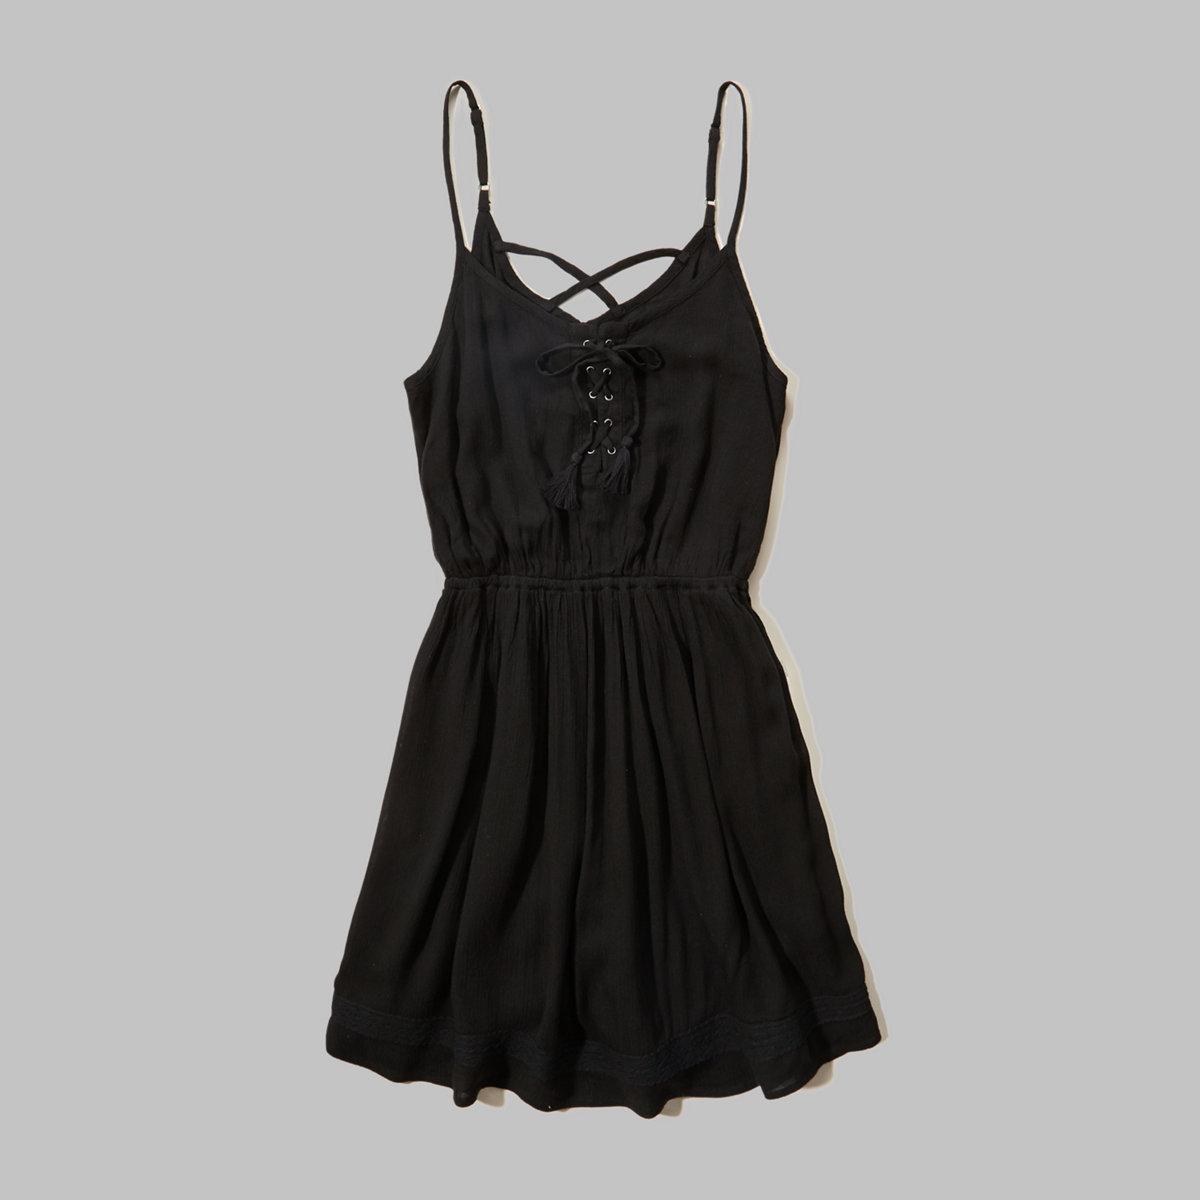 Printed Lace-Trim Skater Dress